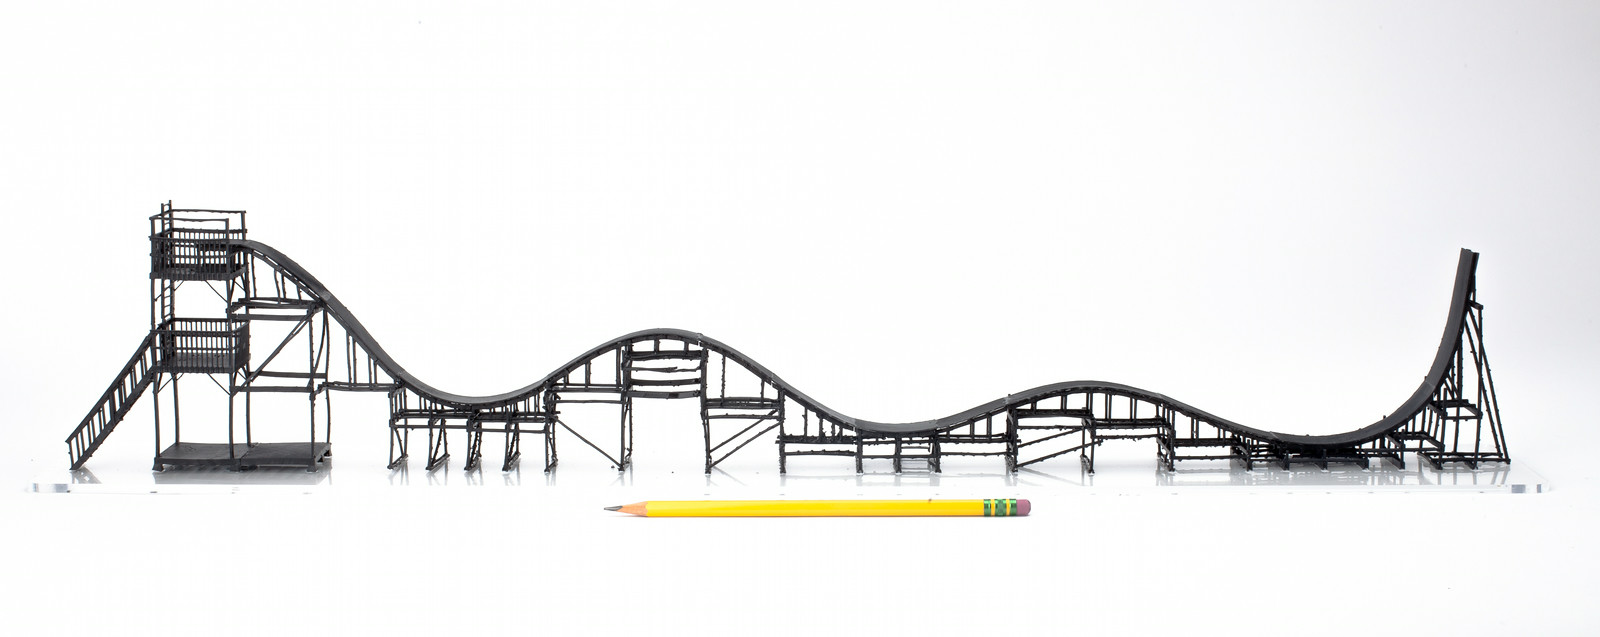 Ben Katz roller coaster